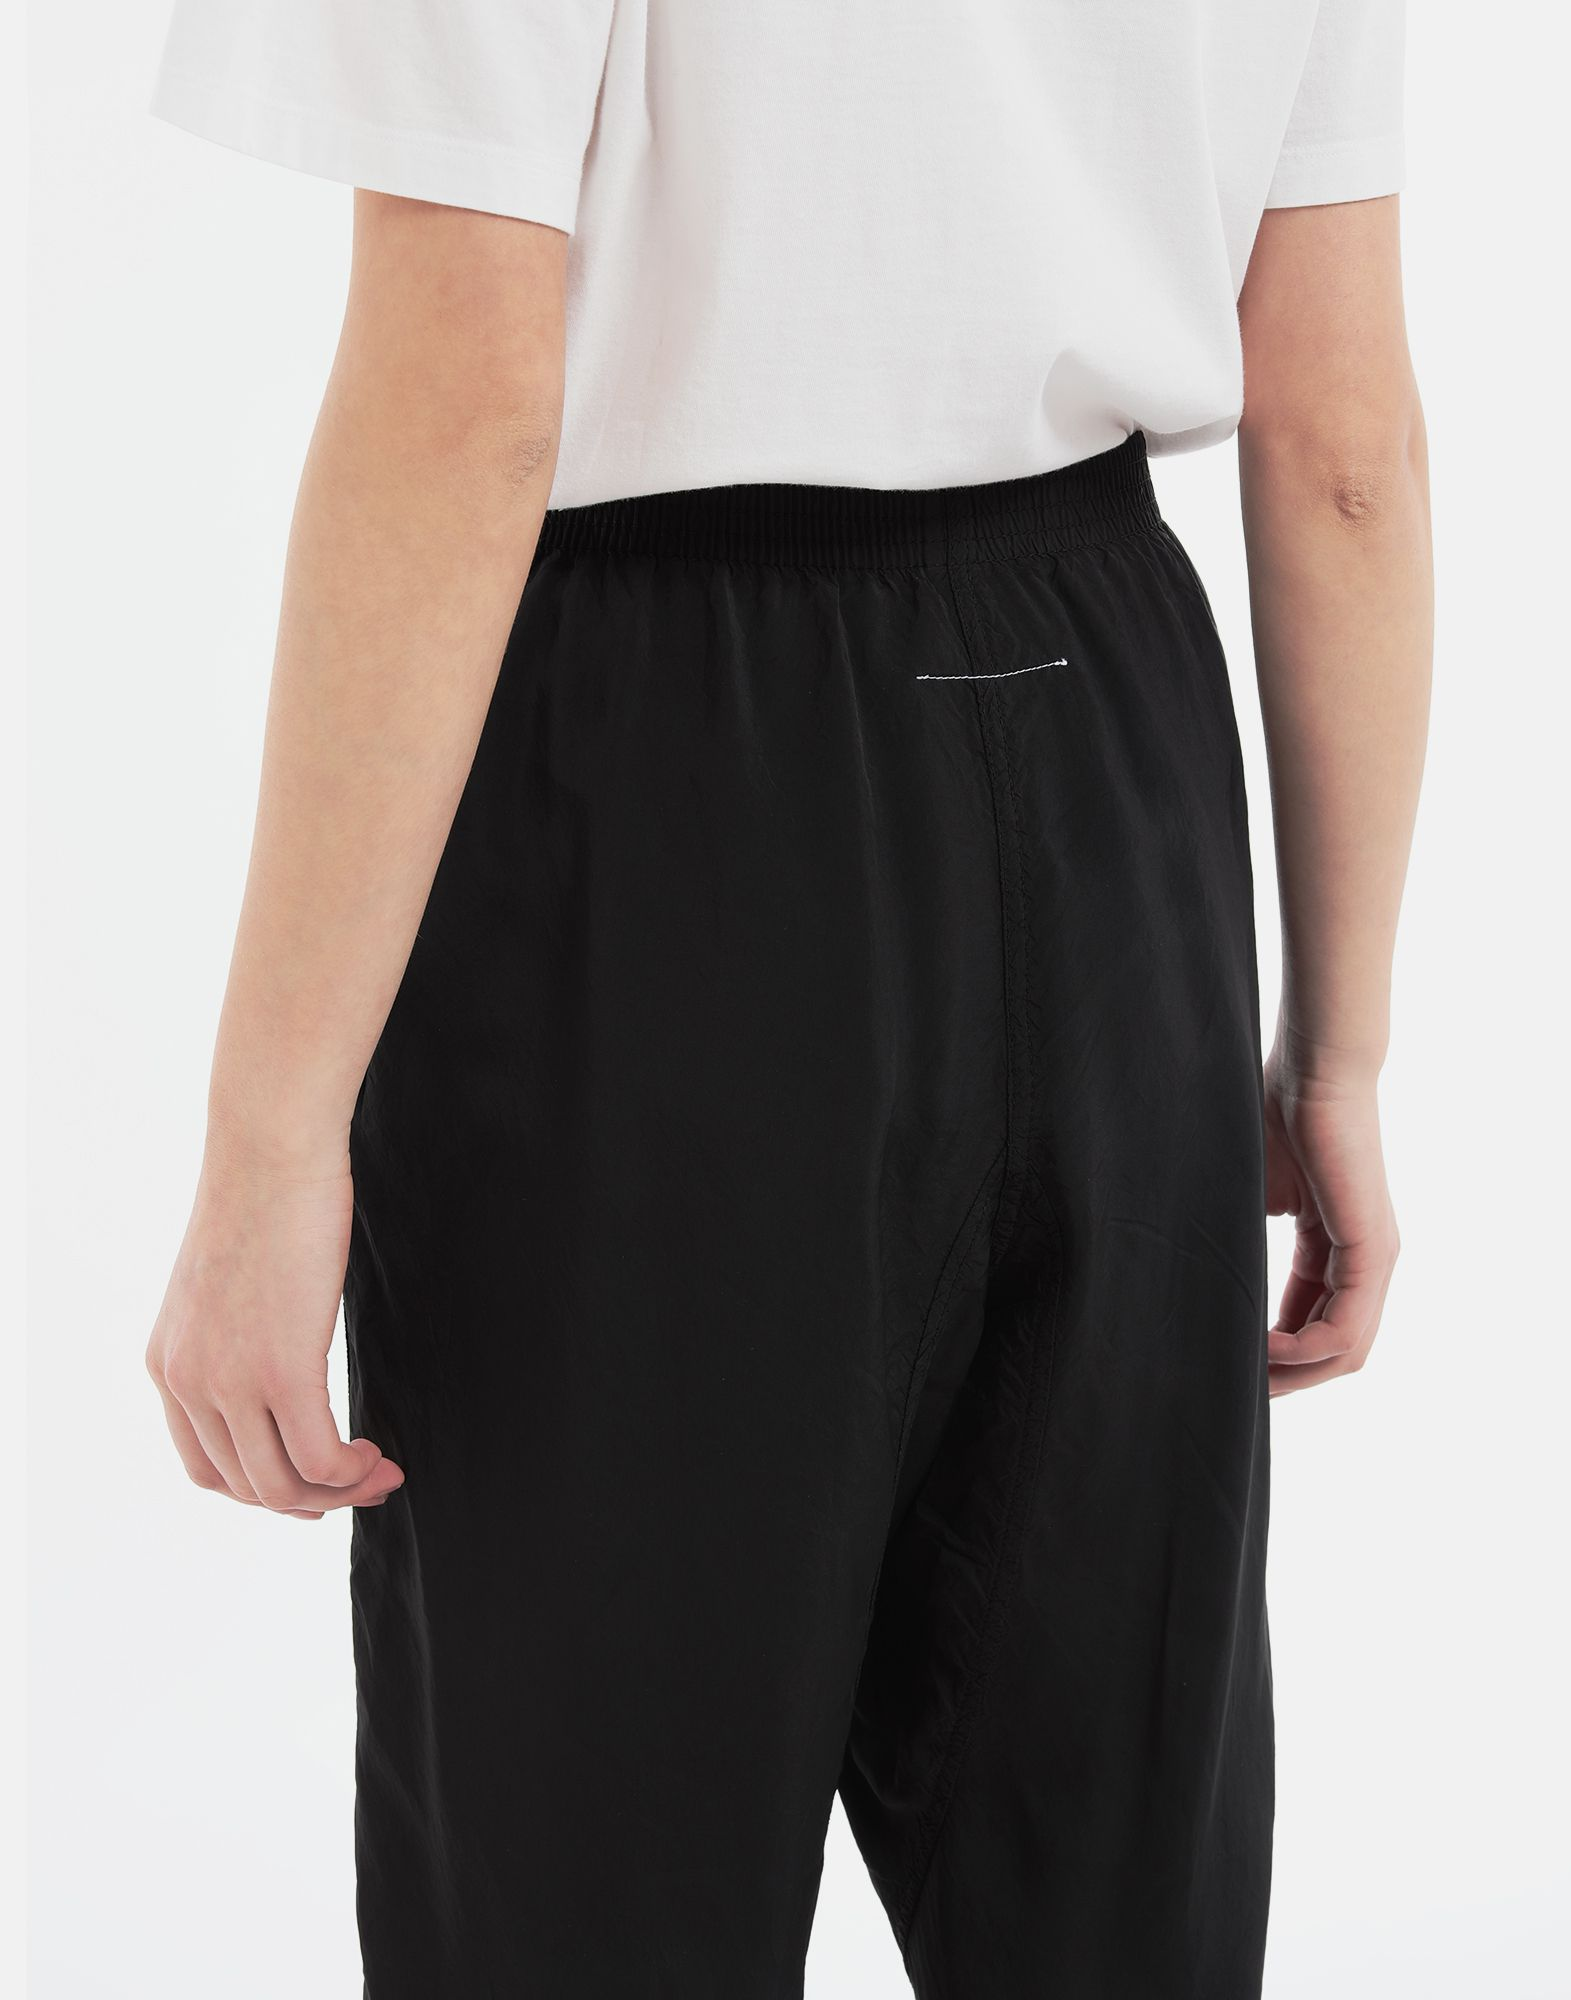 MM6 MAISON MARGIELA Casual pants Woman b